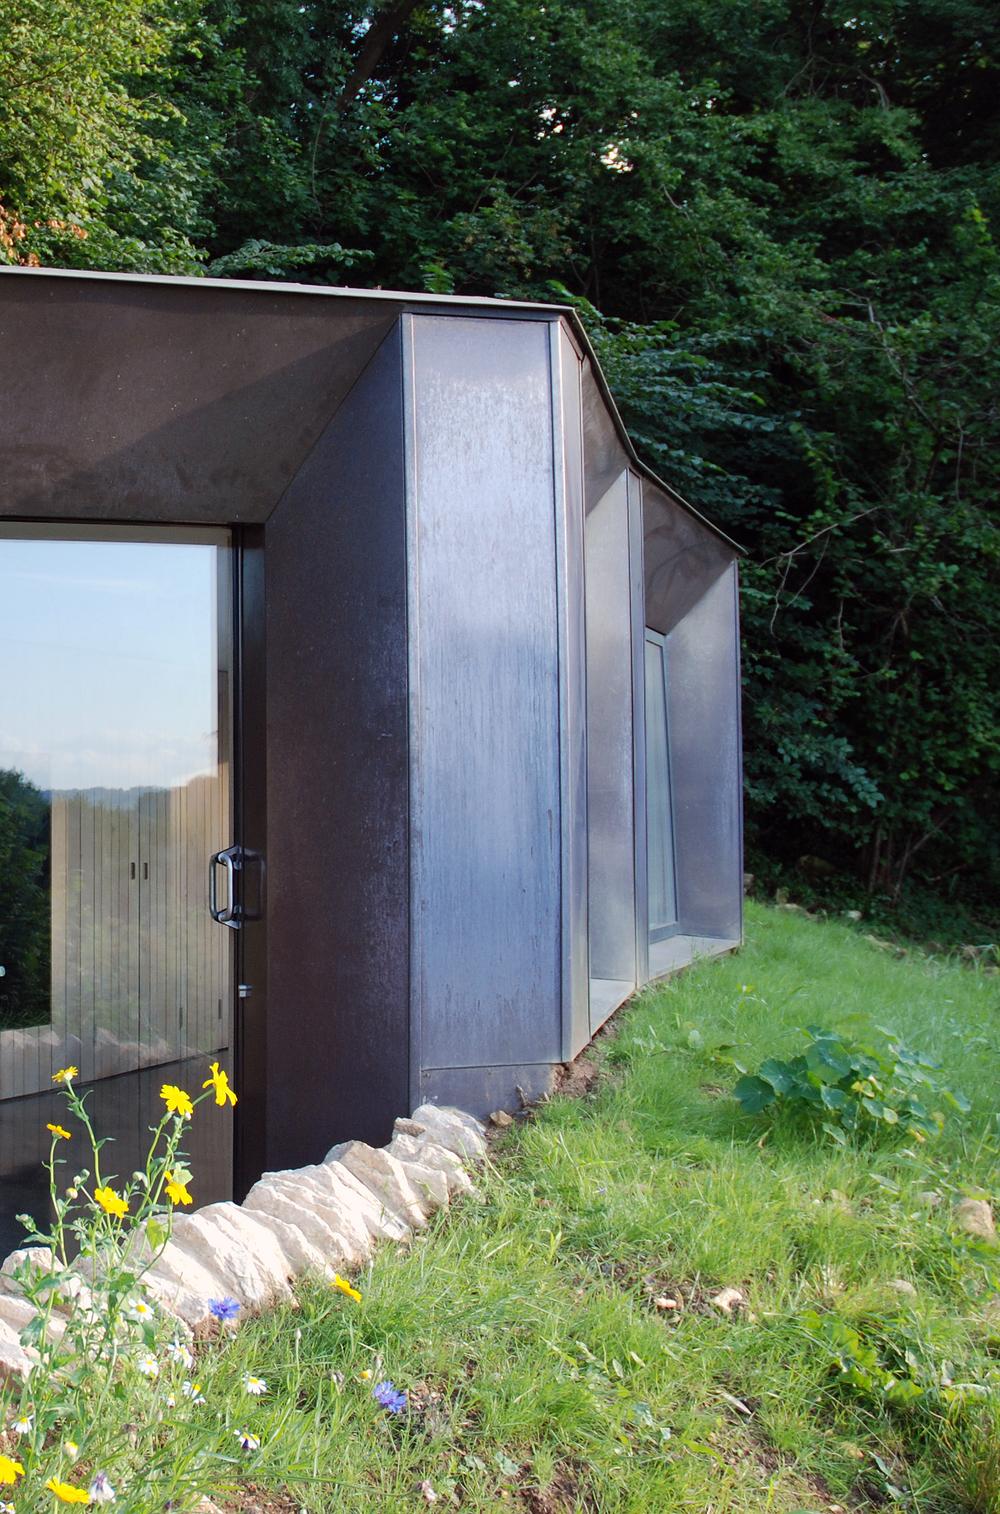 Myrtle cottage garden studio riba national award 2015 for Garden studio